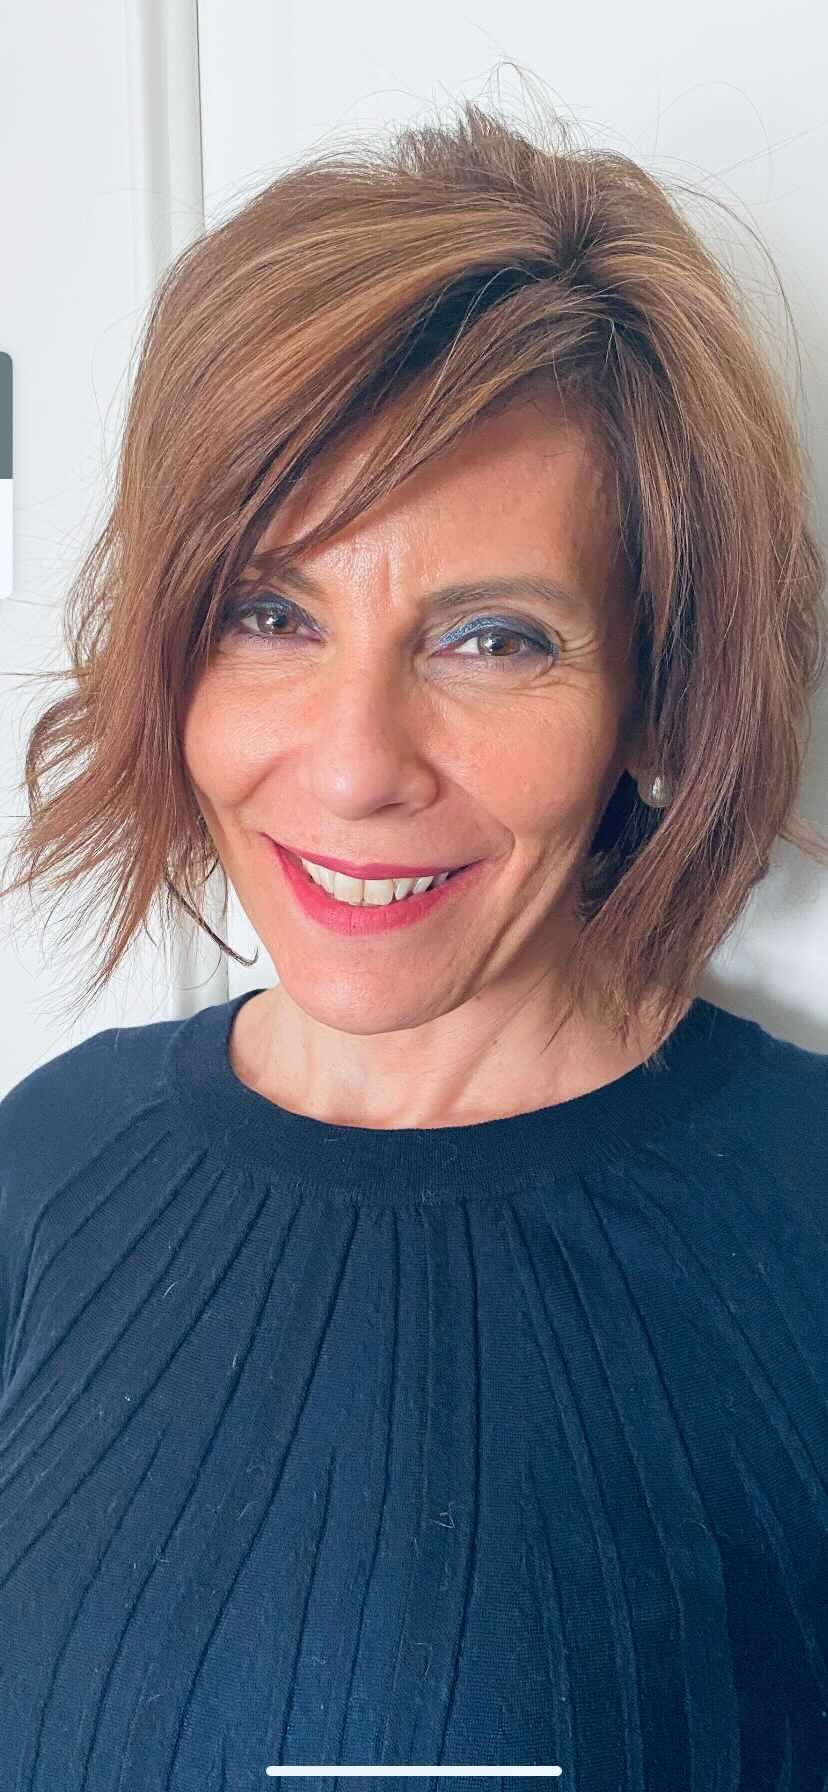 Francesca Seno